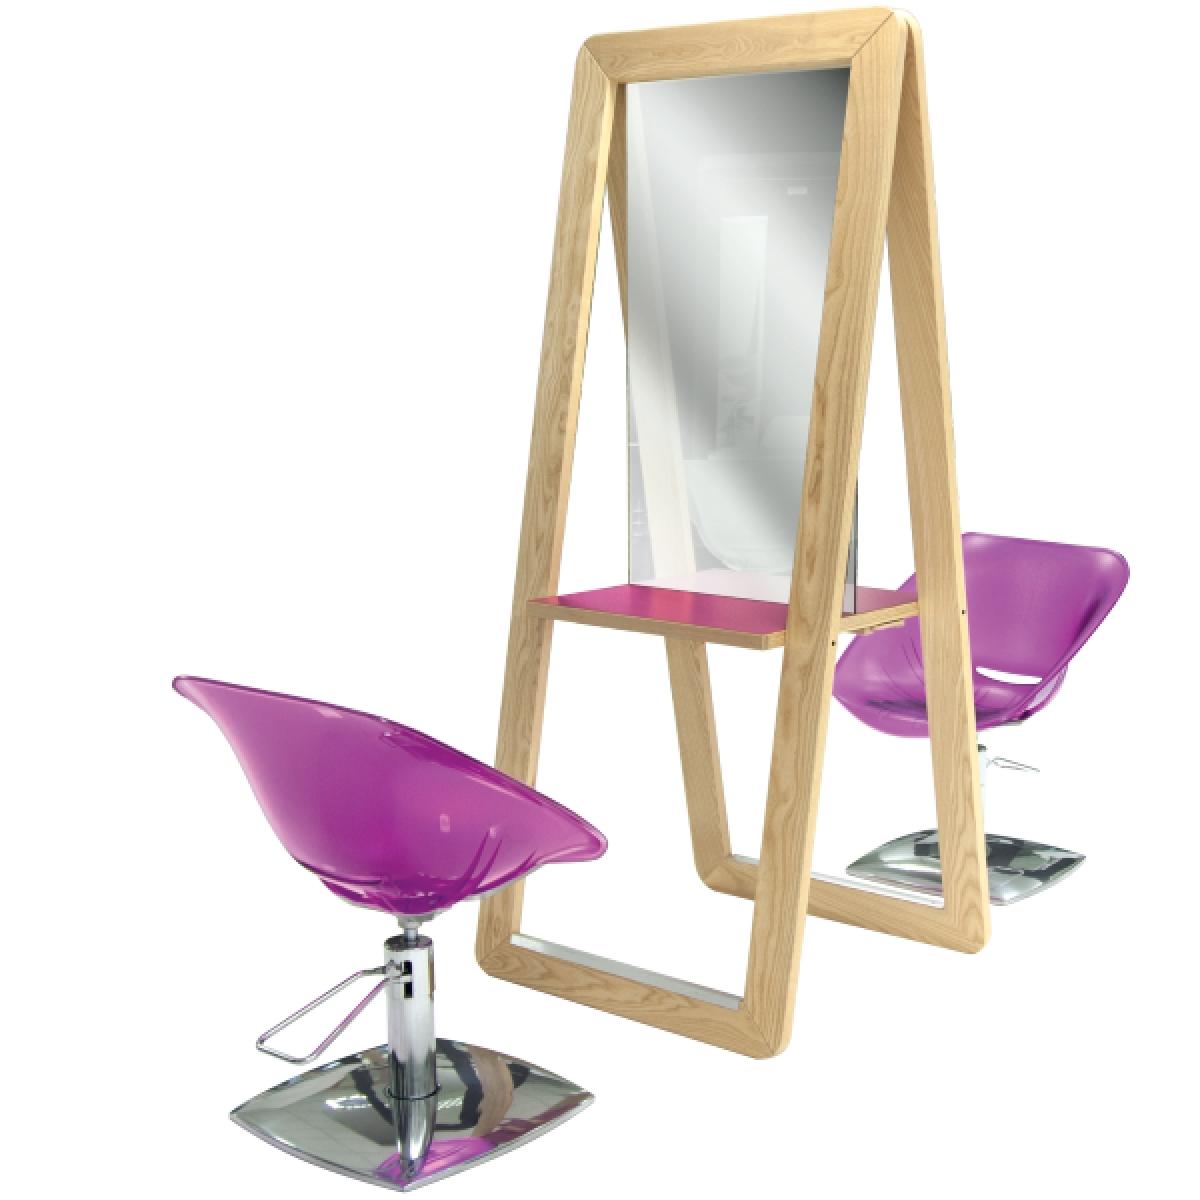 Salon Supply Store, Modern Salon Furniture, Cerrotti Salon Furniture